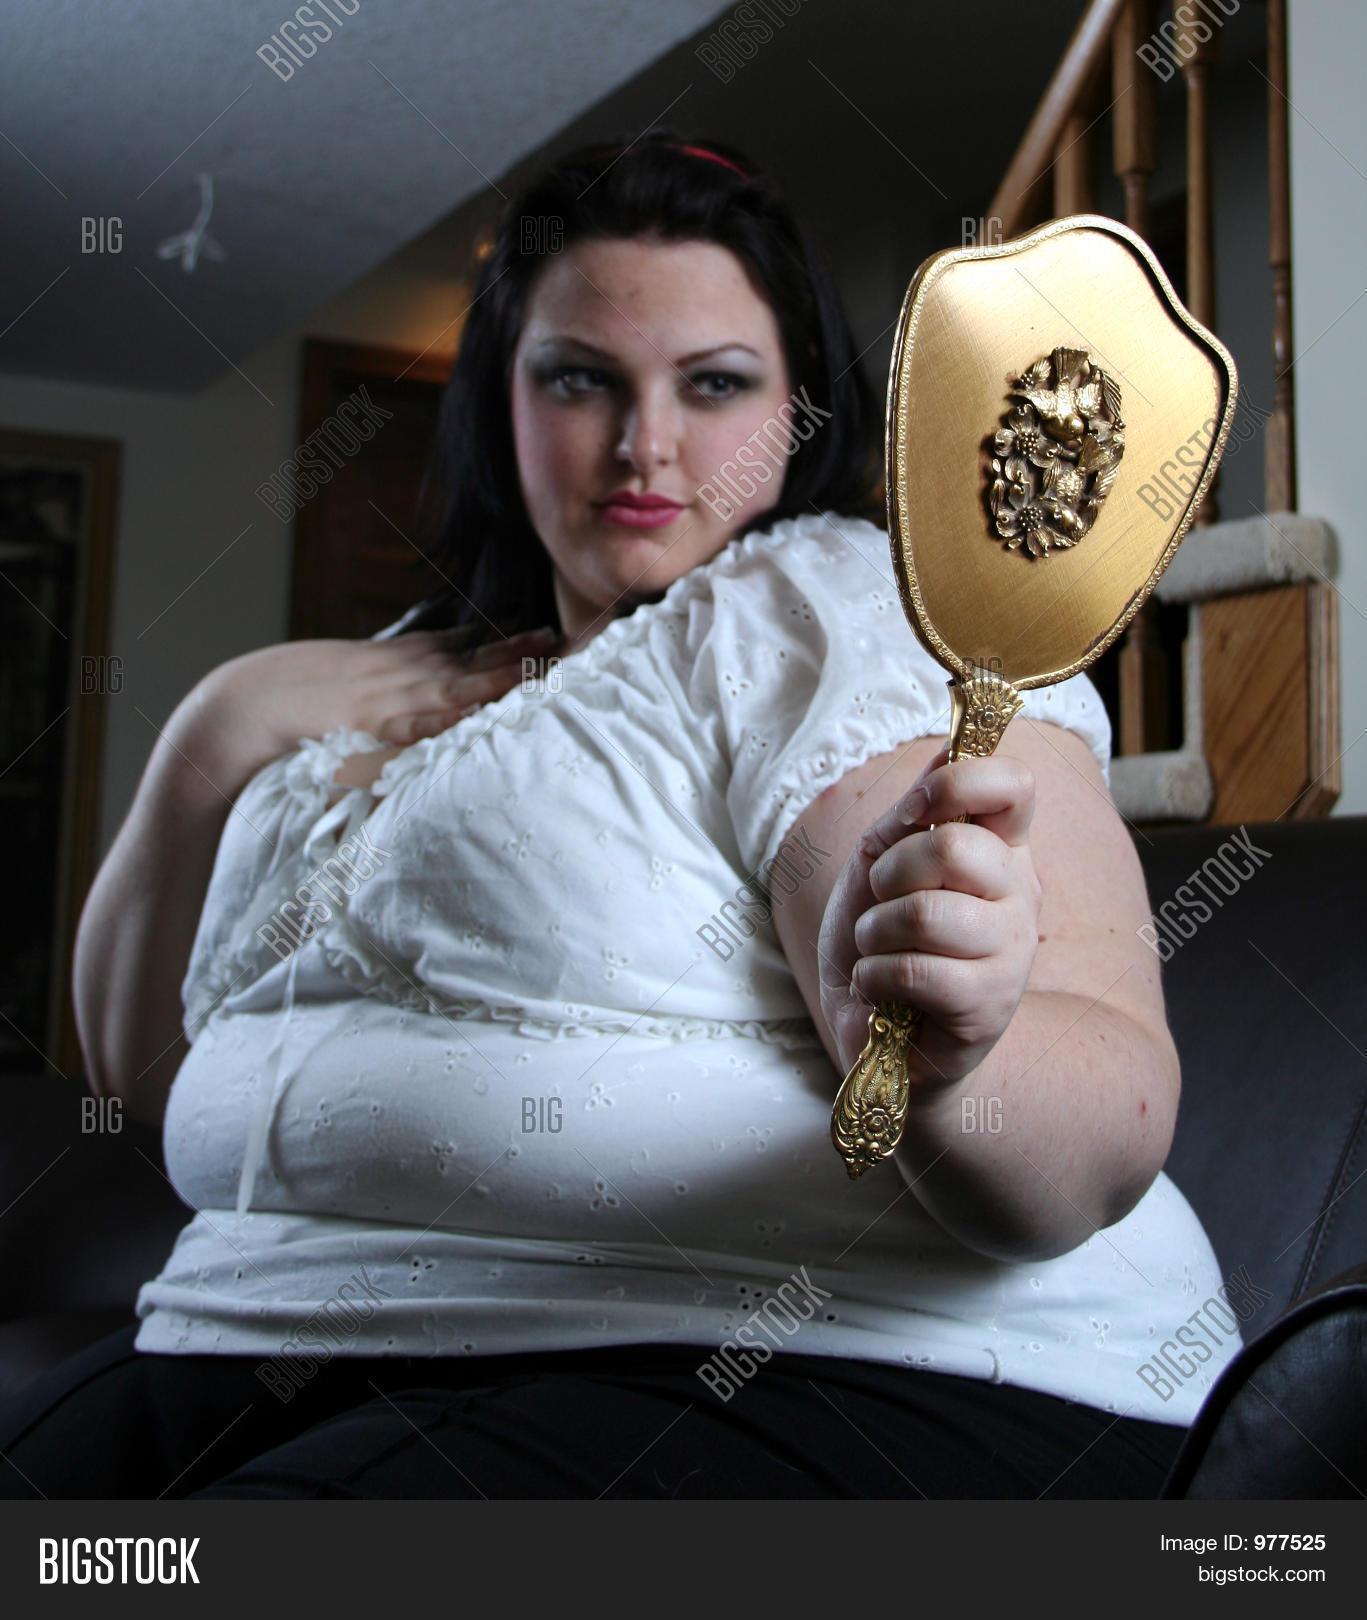 Big woman got